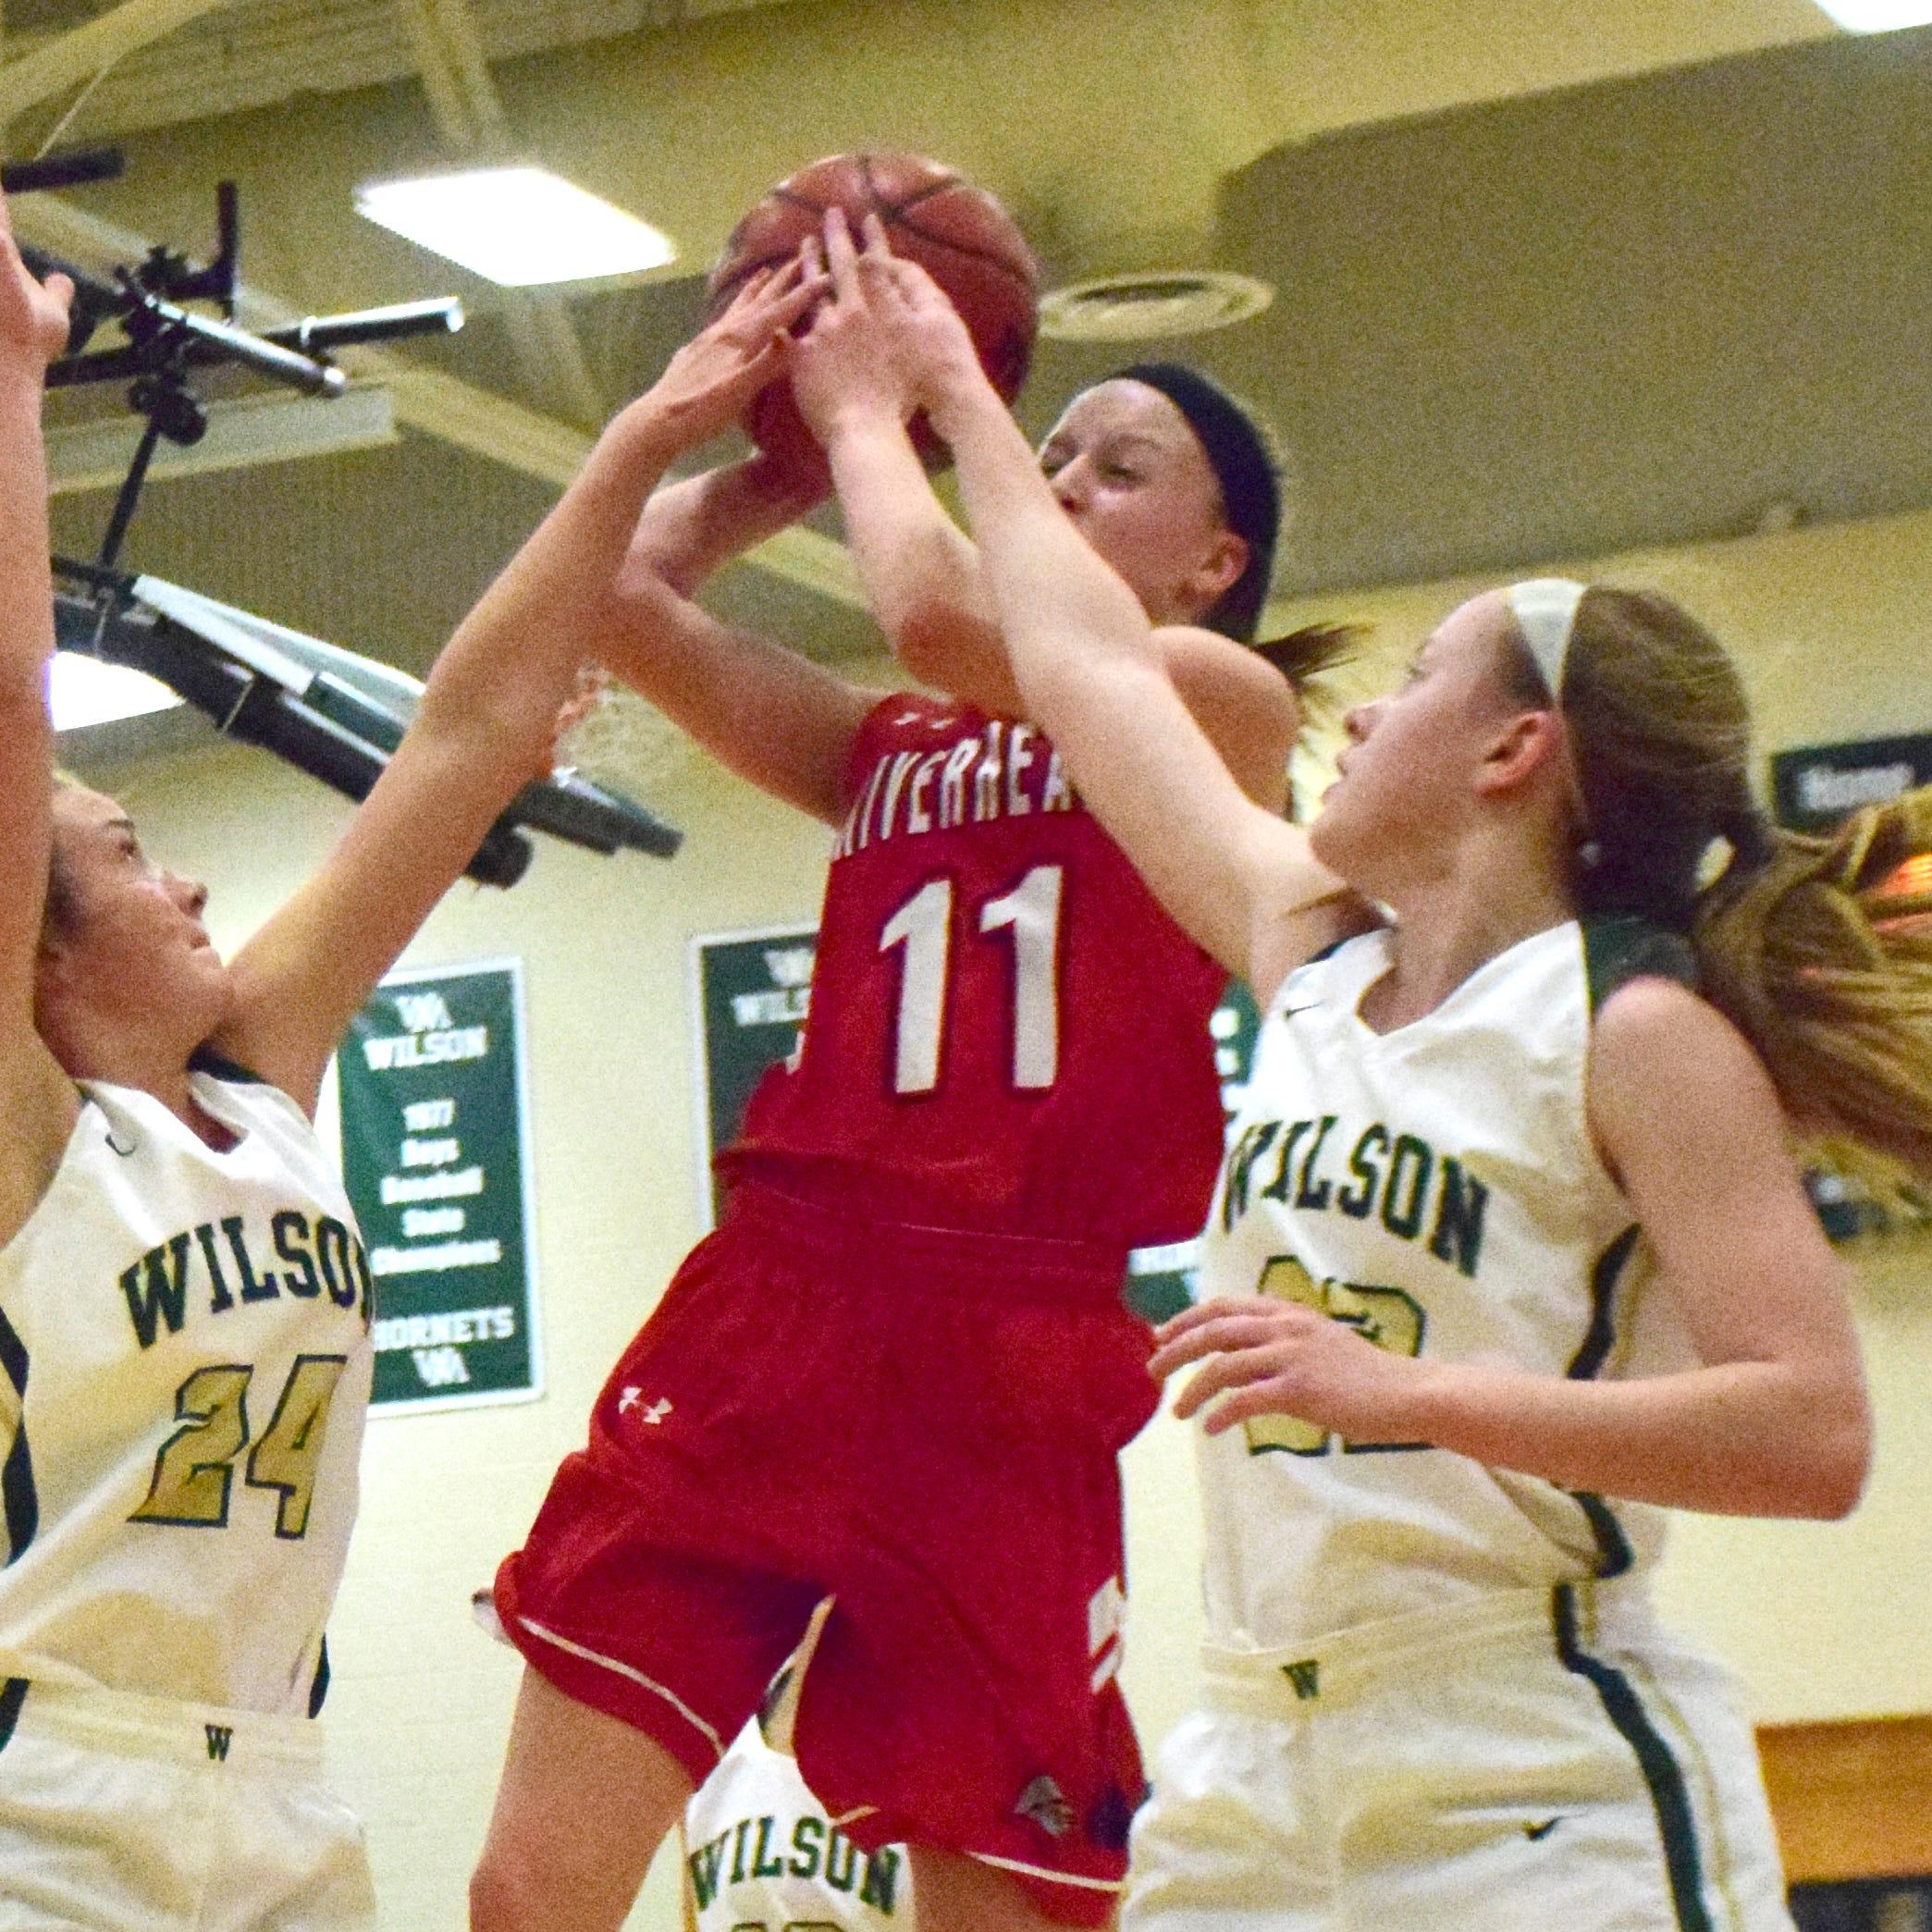 Riverheads' Sara Moore is big into basketball